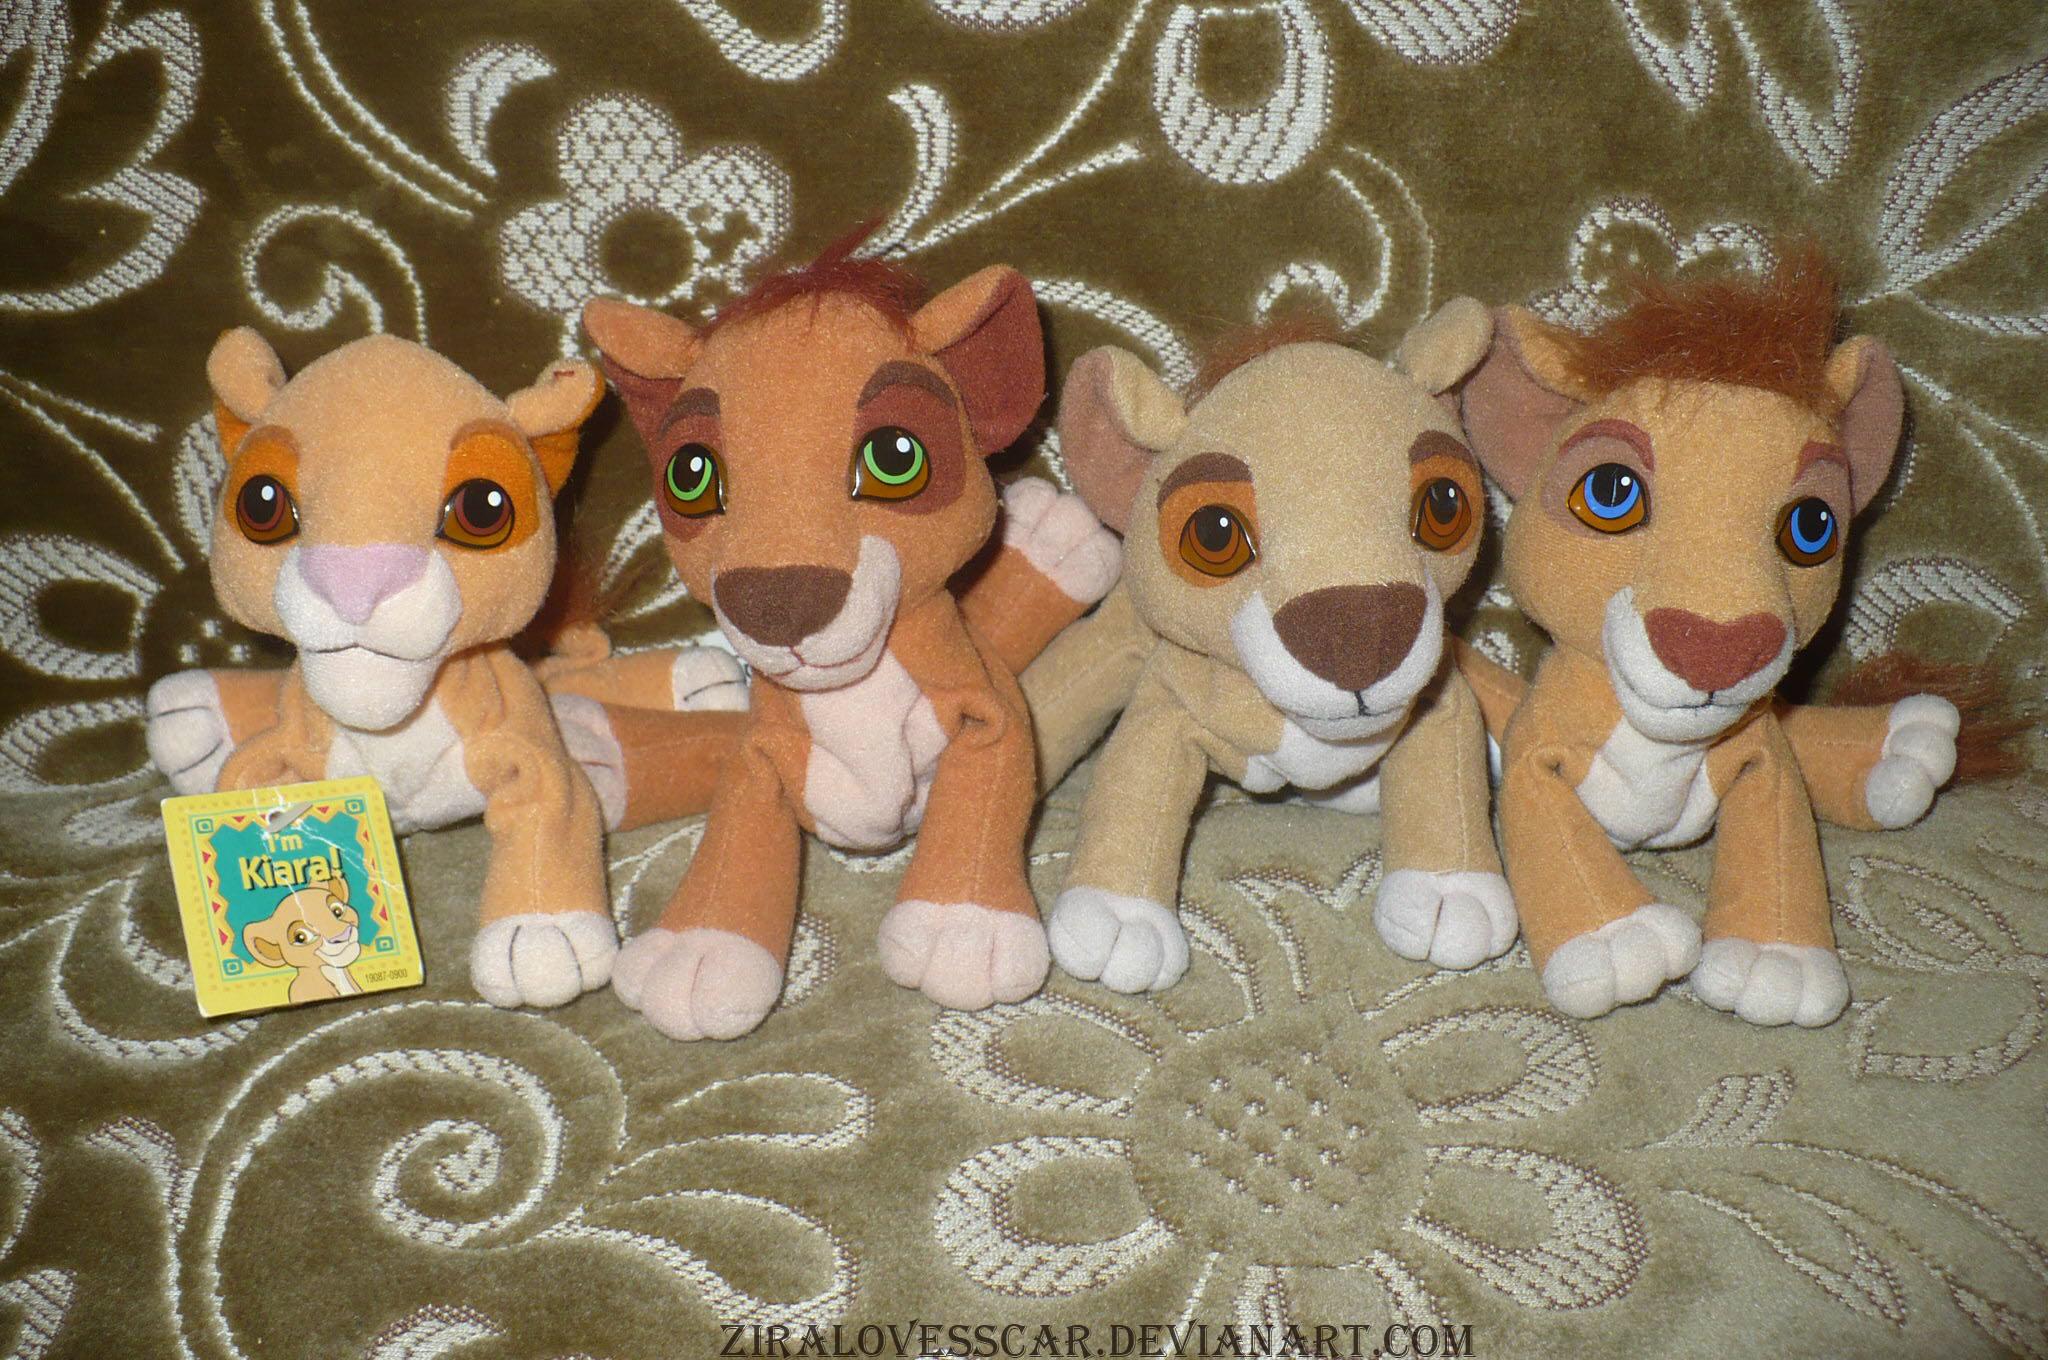 Simba's Pride lion king plush by ZiraLovesScar